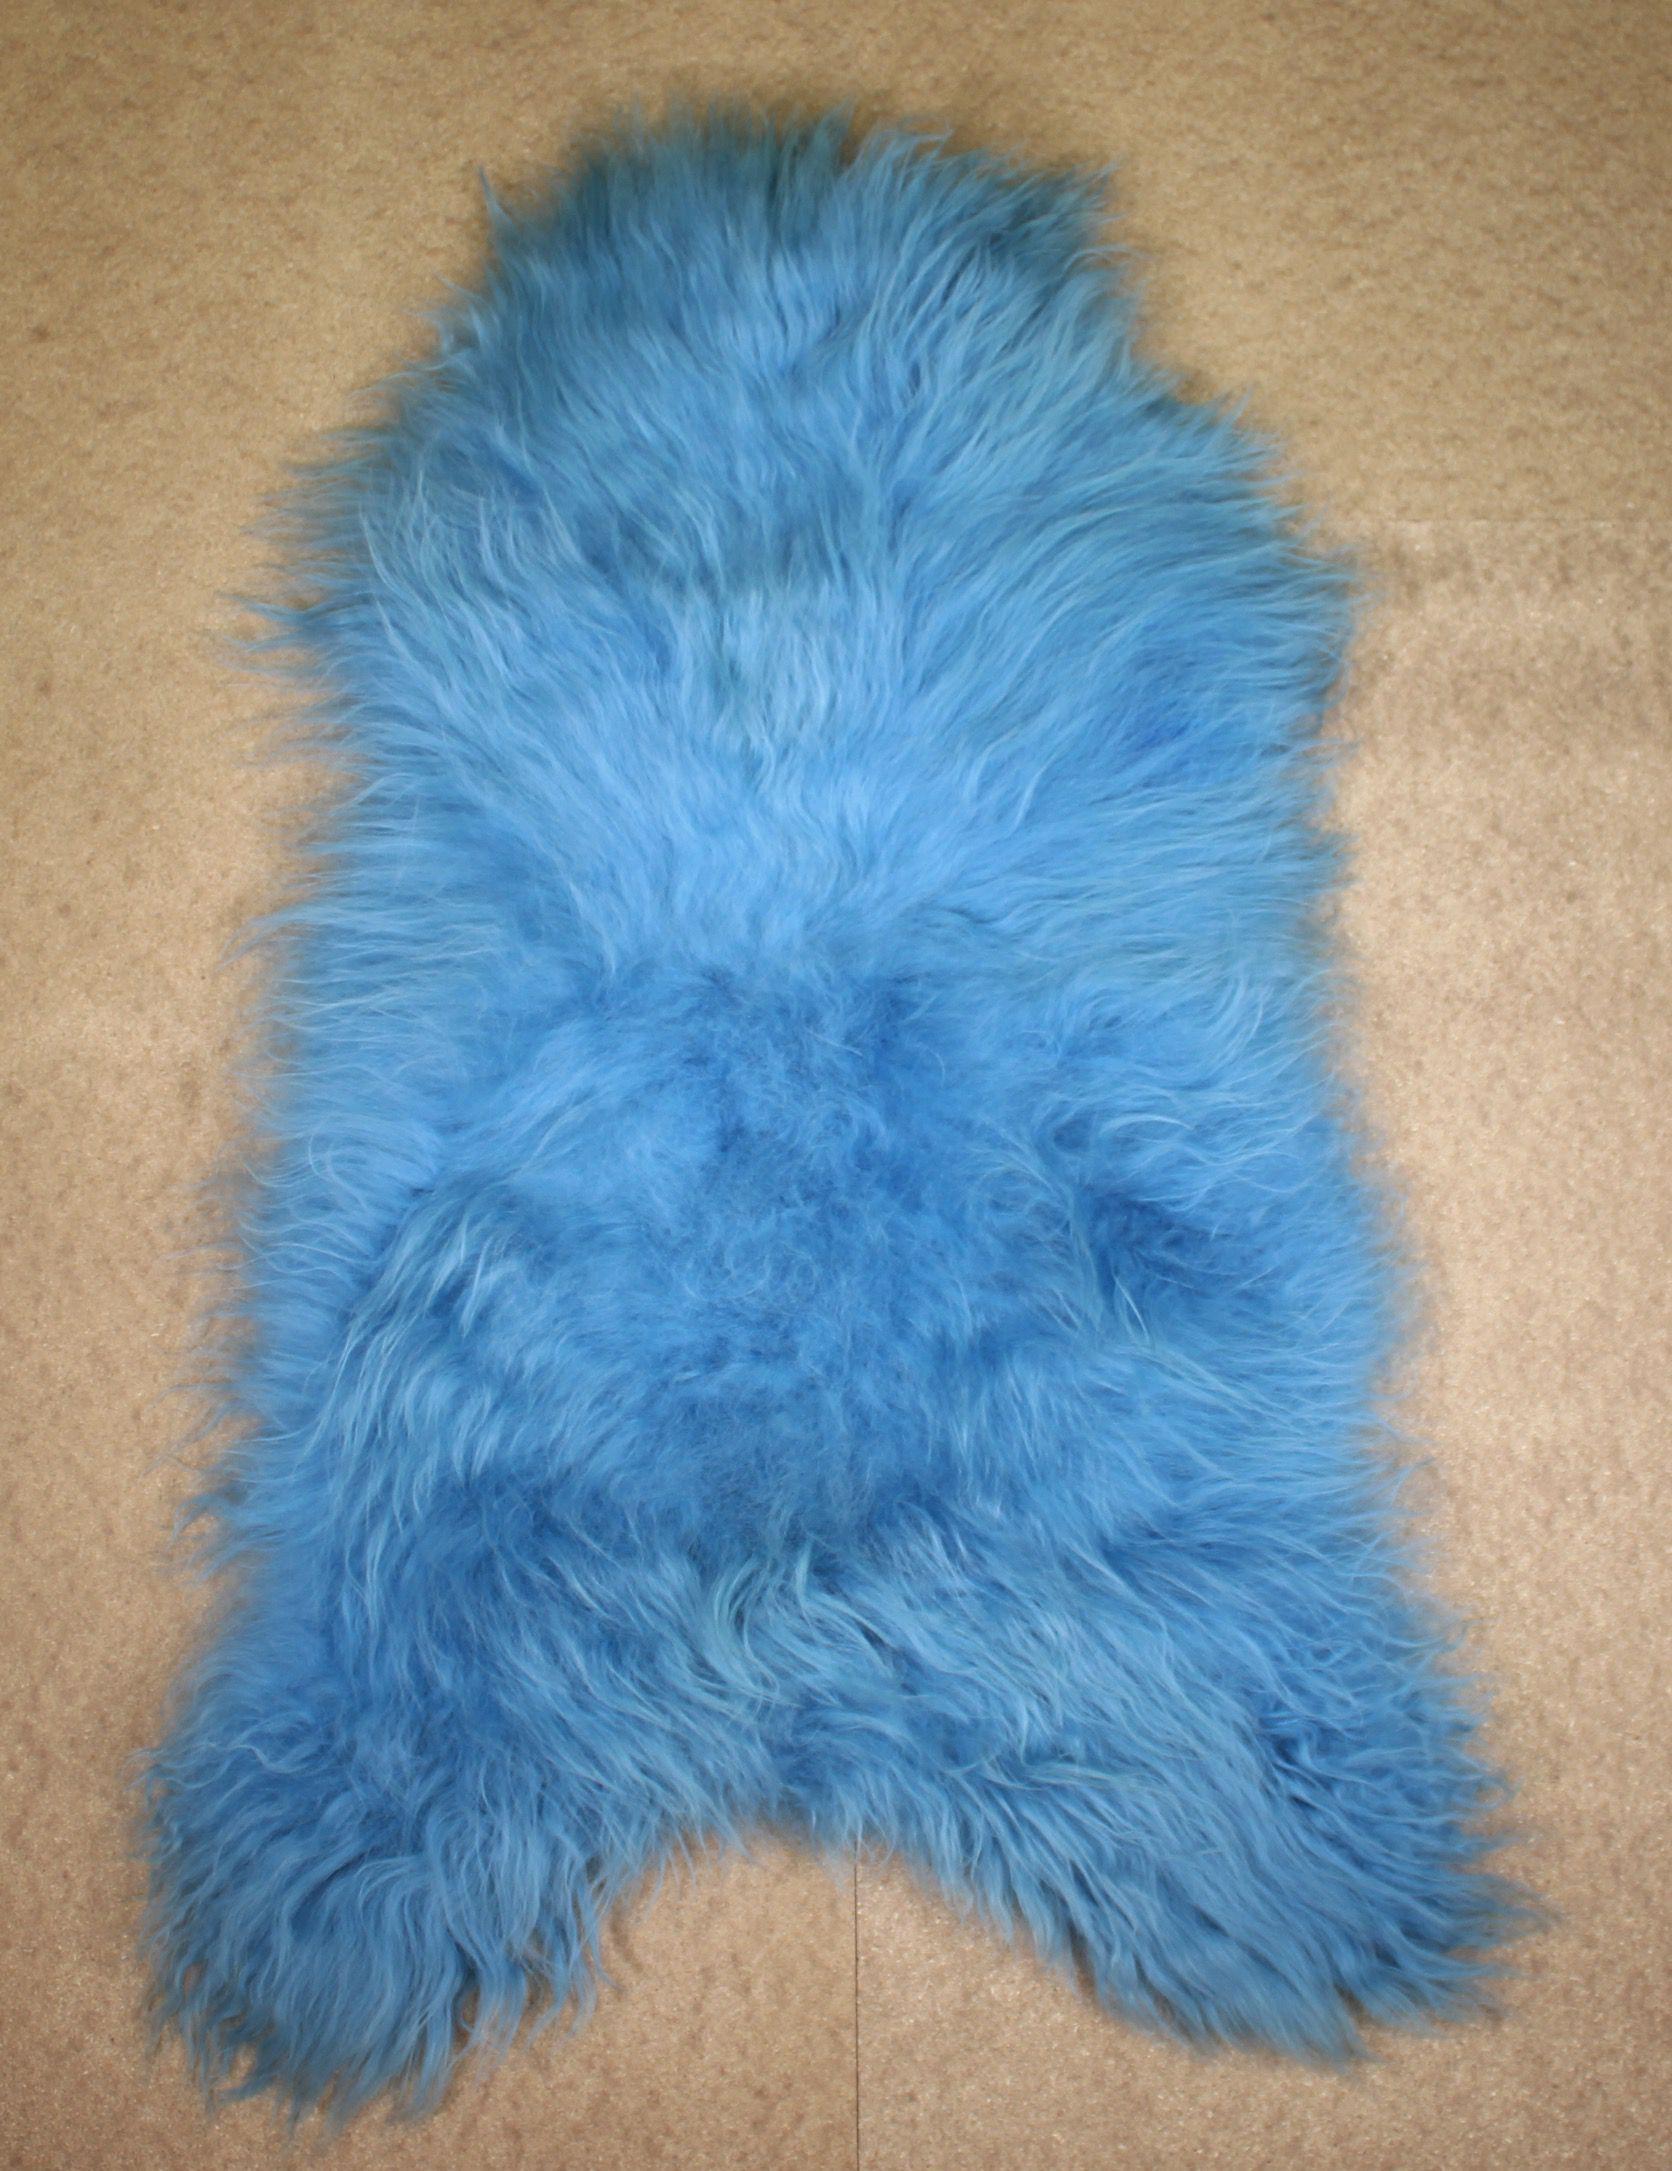 Blue Icelandic Sheepskin M